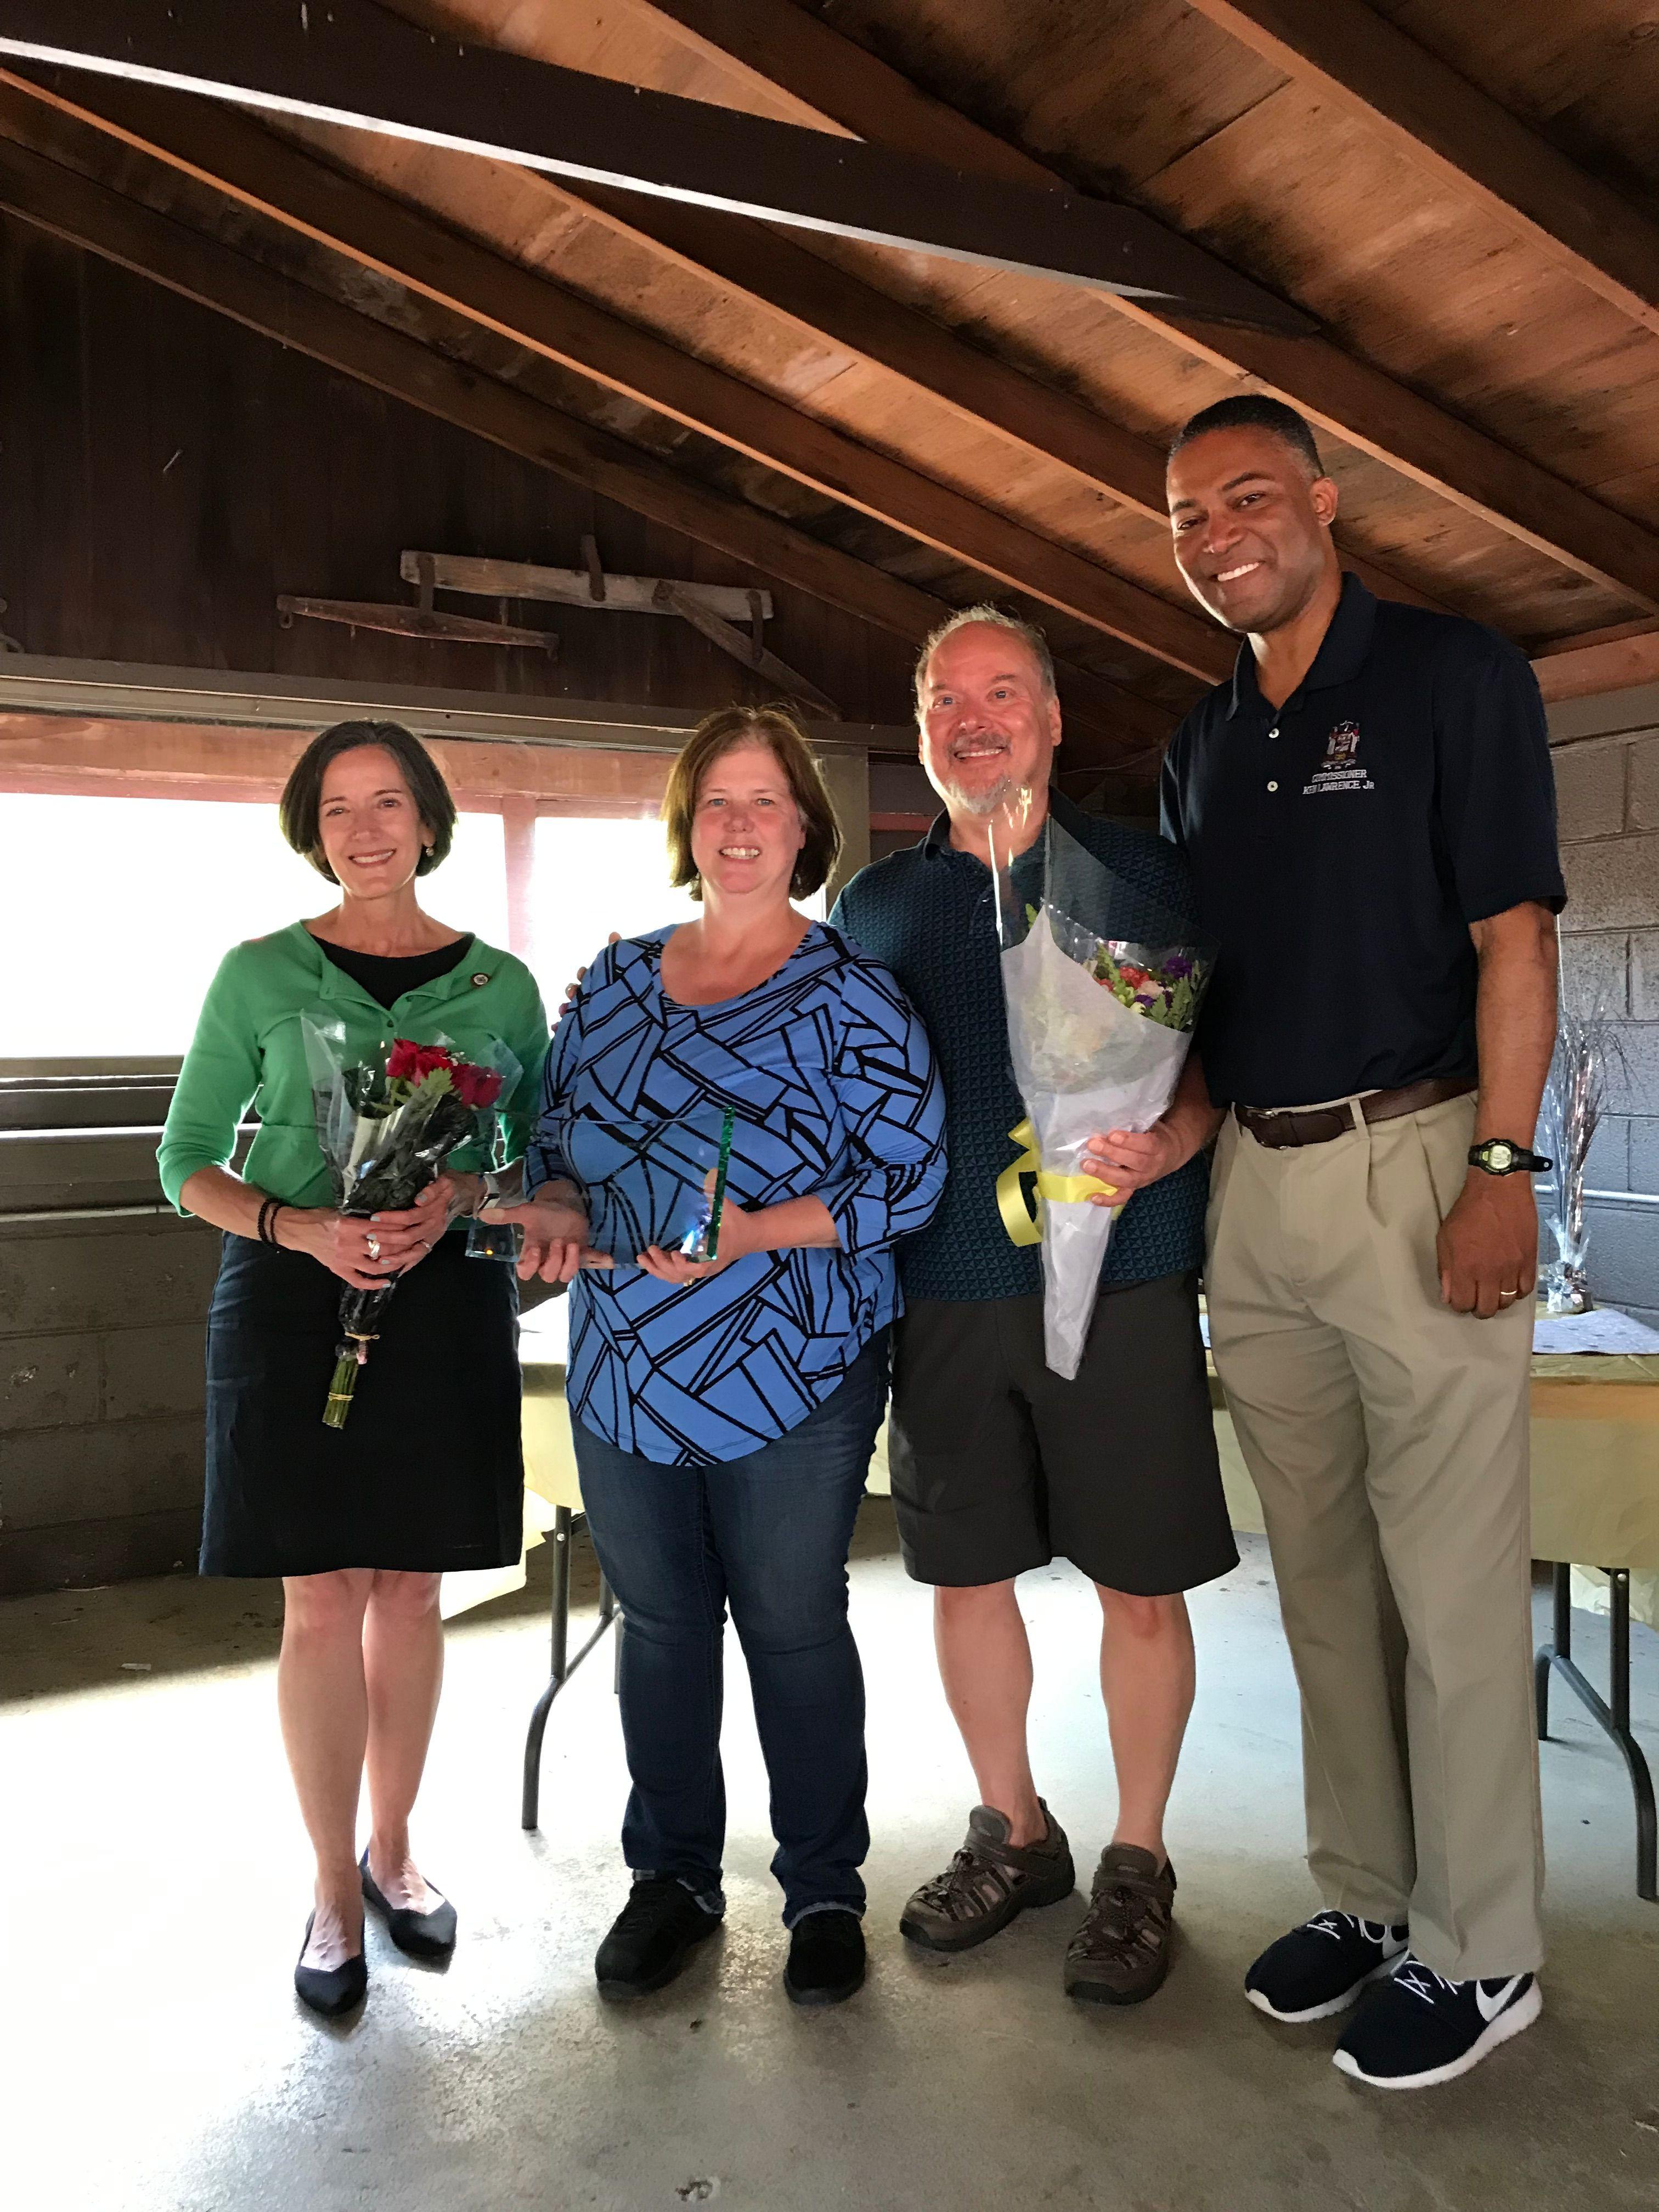 Sue Shannon wins prestigious Dr. Miller Award